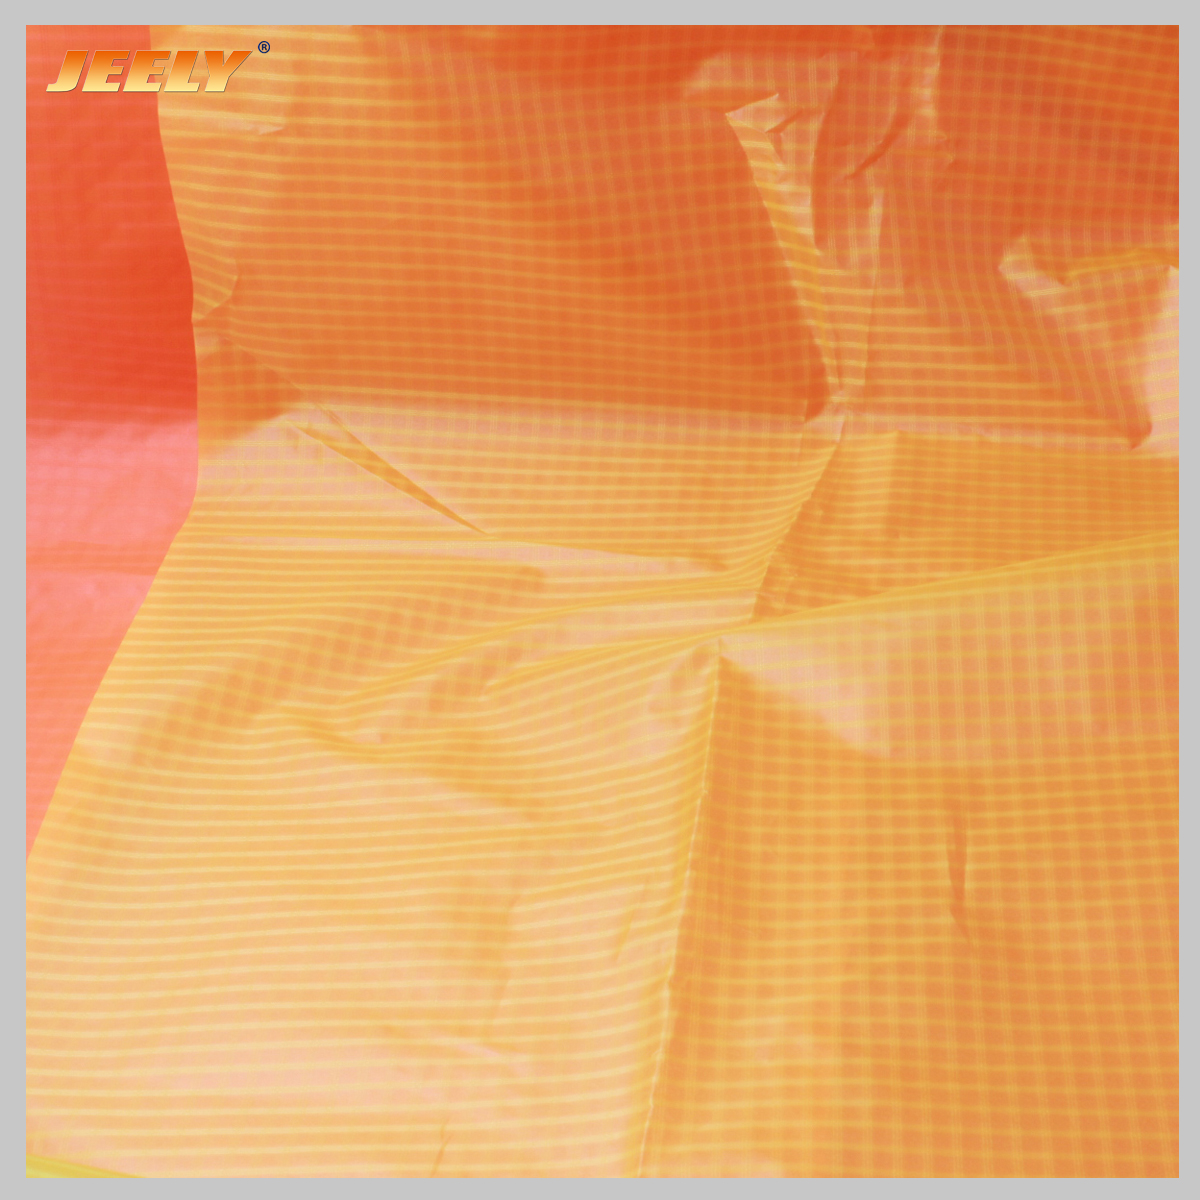 Teijin Technoforce D3 51gsm 59/60'' Ripstop Waterproof Fabric Paper Feeling Cloth Kite,parachute,paraglider Canopy Repair